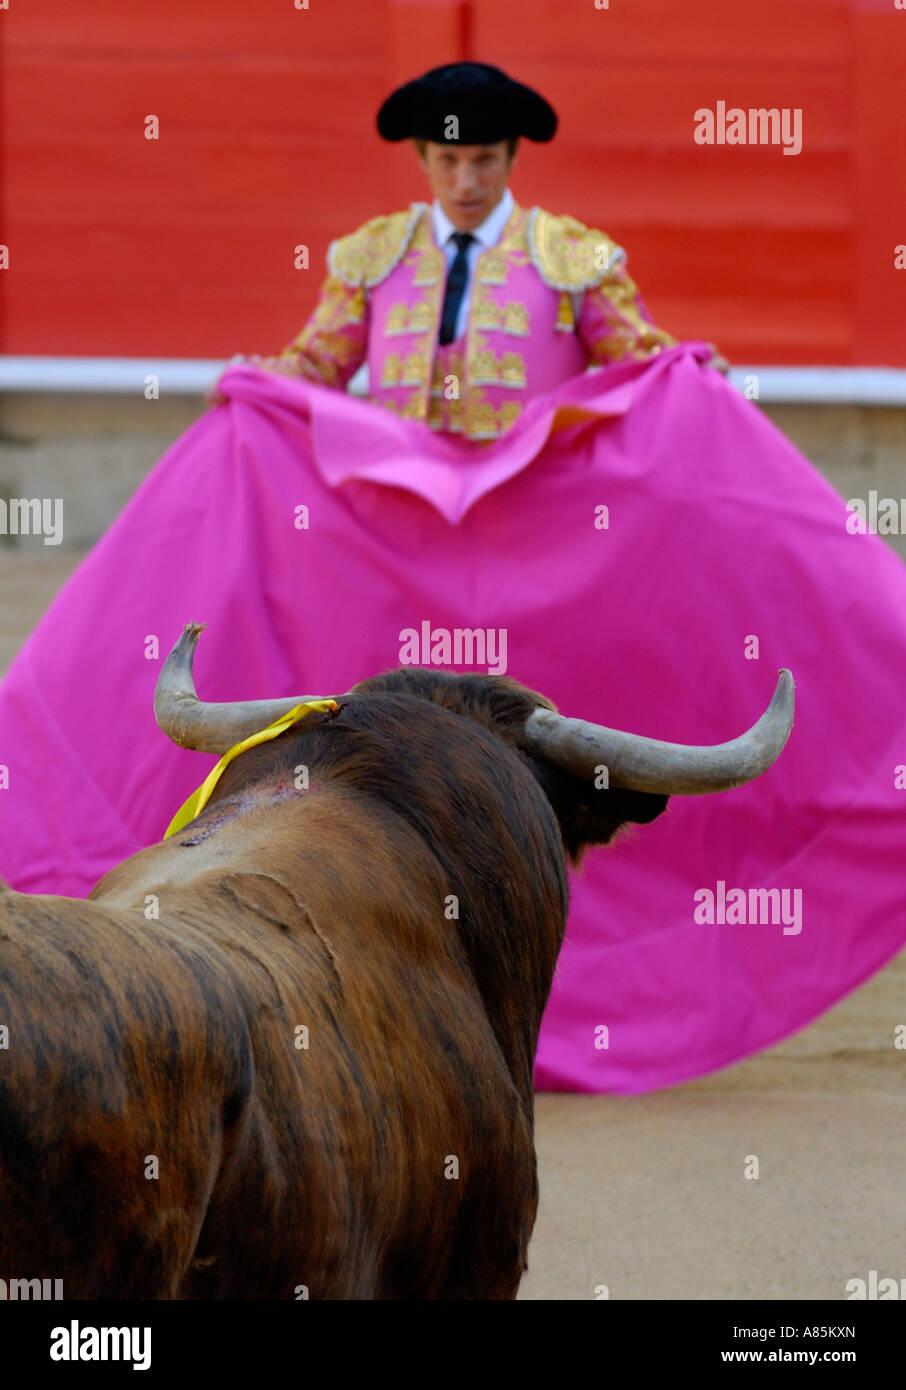 SPANISH BULLFIGHTER BARCELONA CATALONIA SPAIN Stock Photo